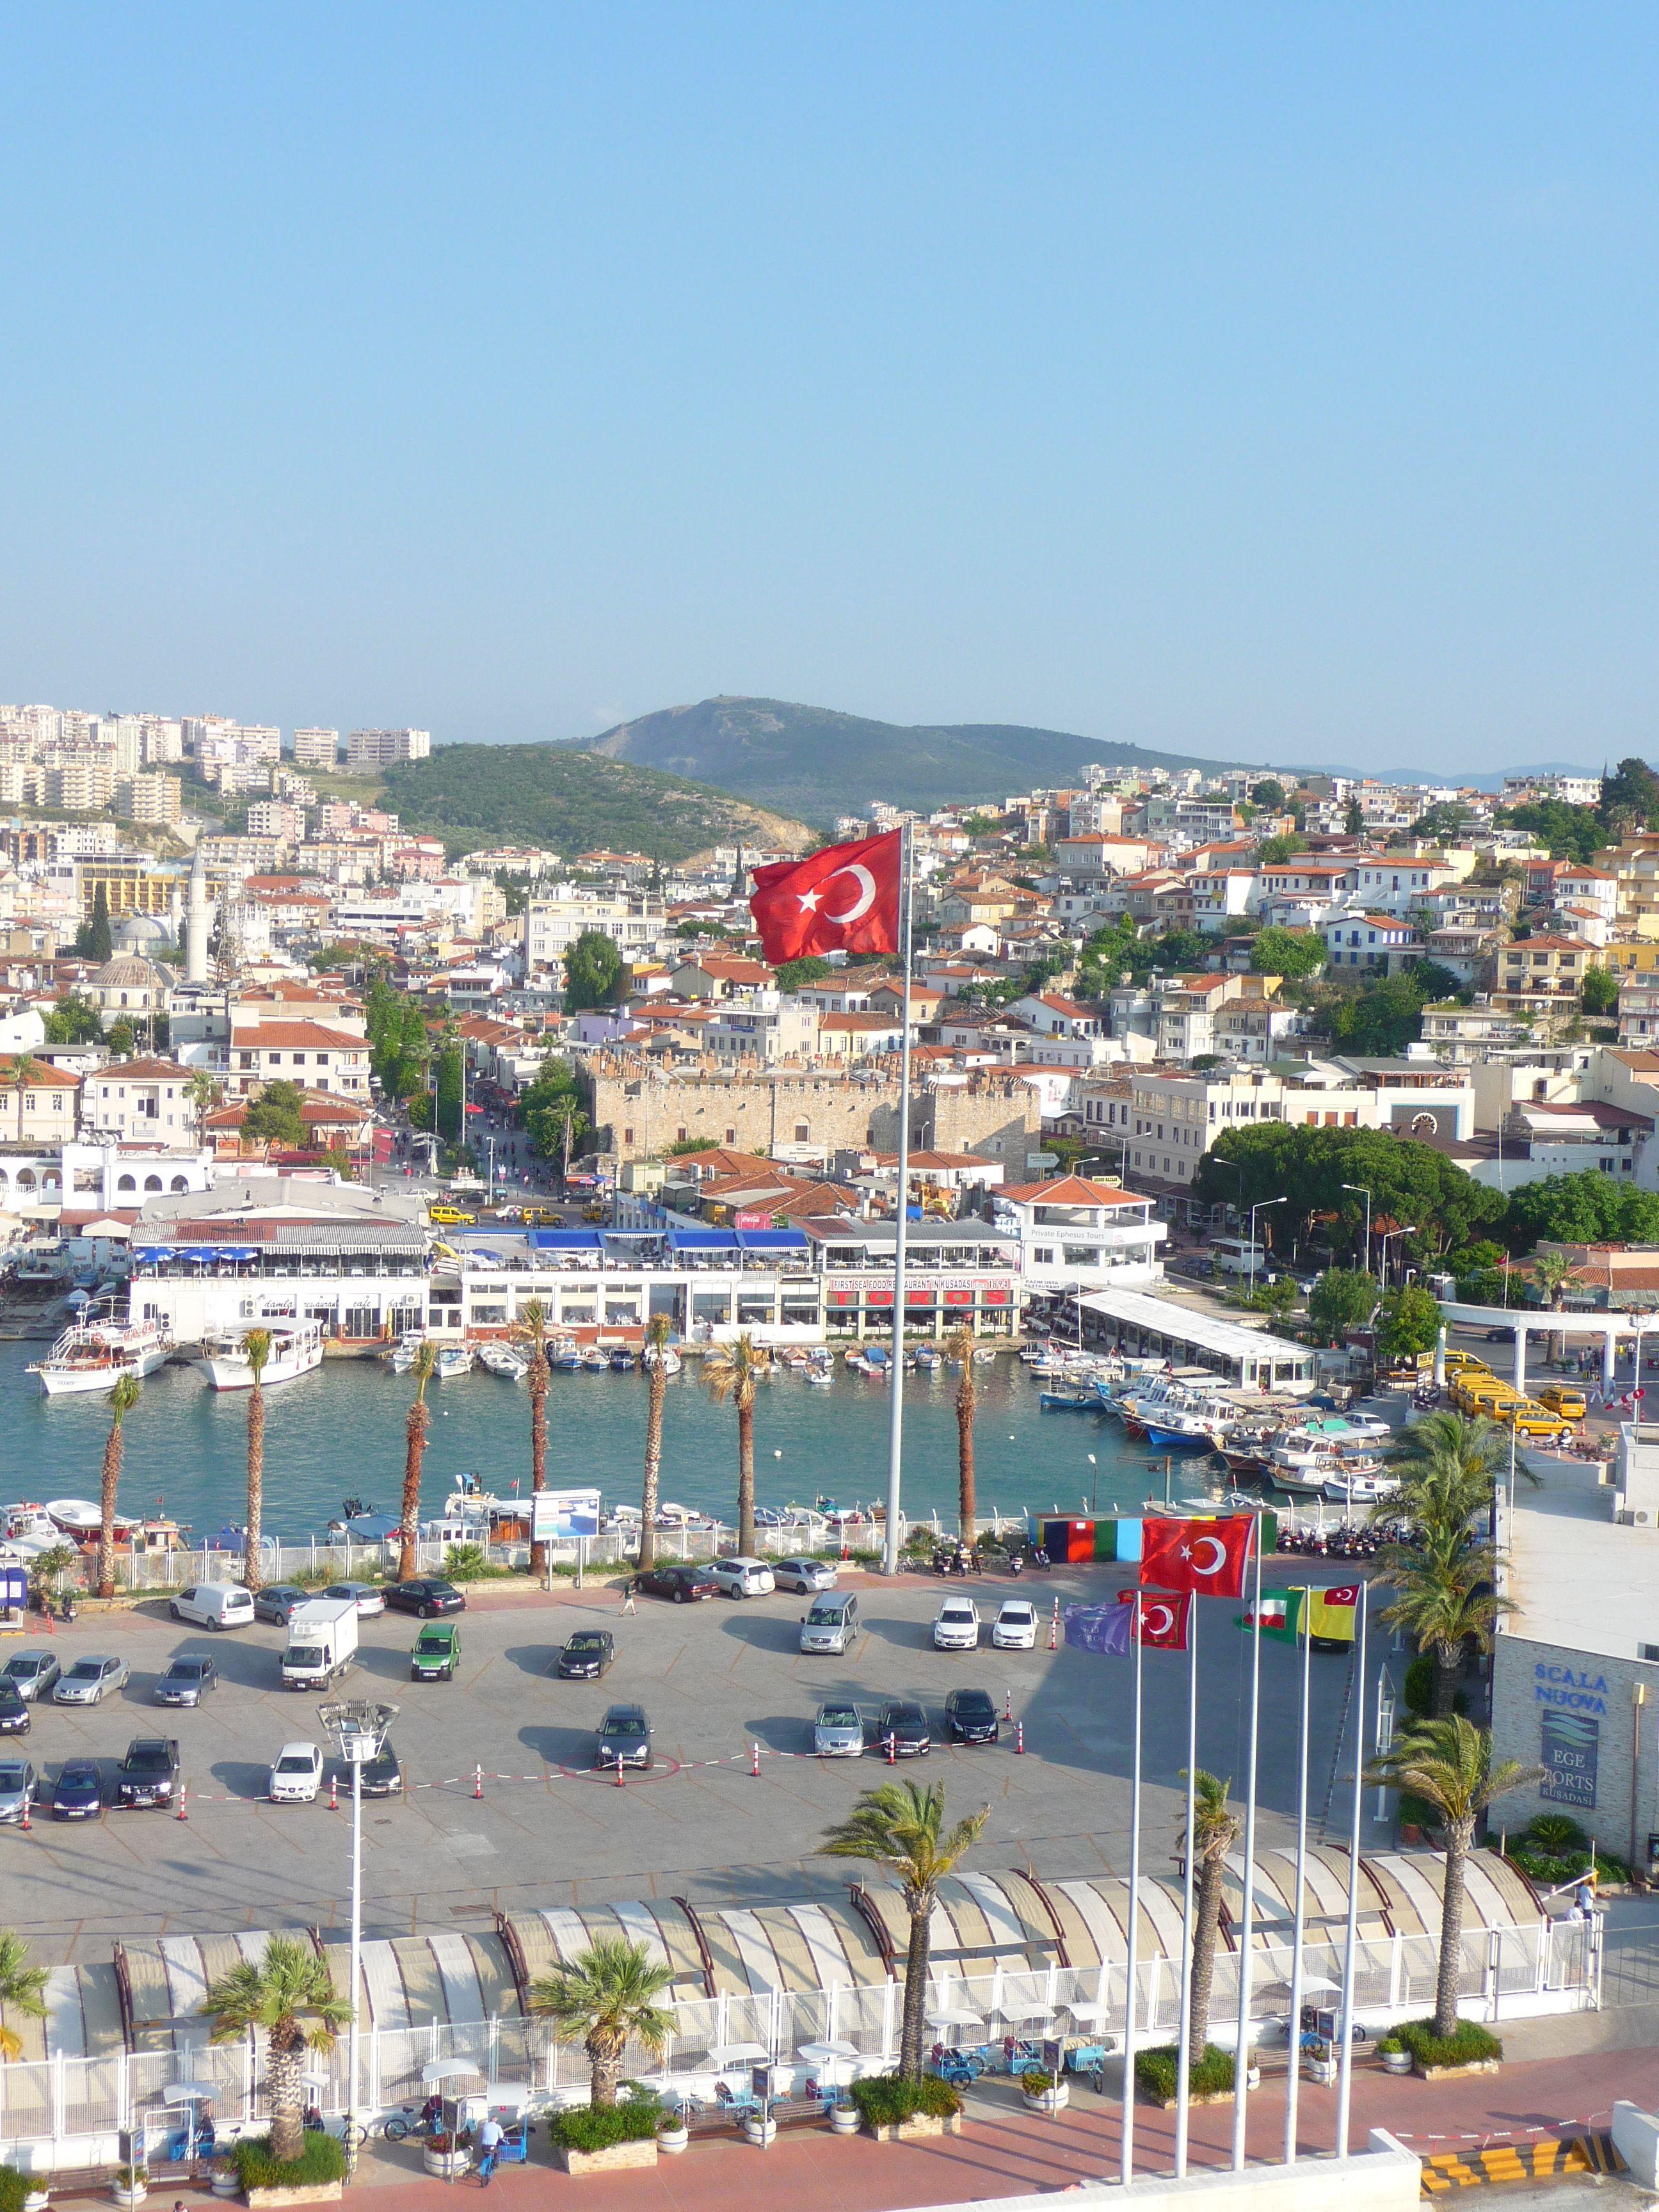 The port of kusadasi our travels kusadasi ephesus turkey pinterest kusadasi cruises - Ephesus turkey cruise port ...